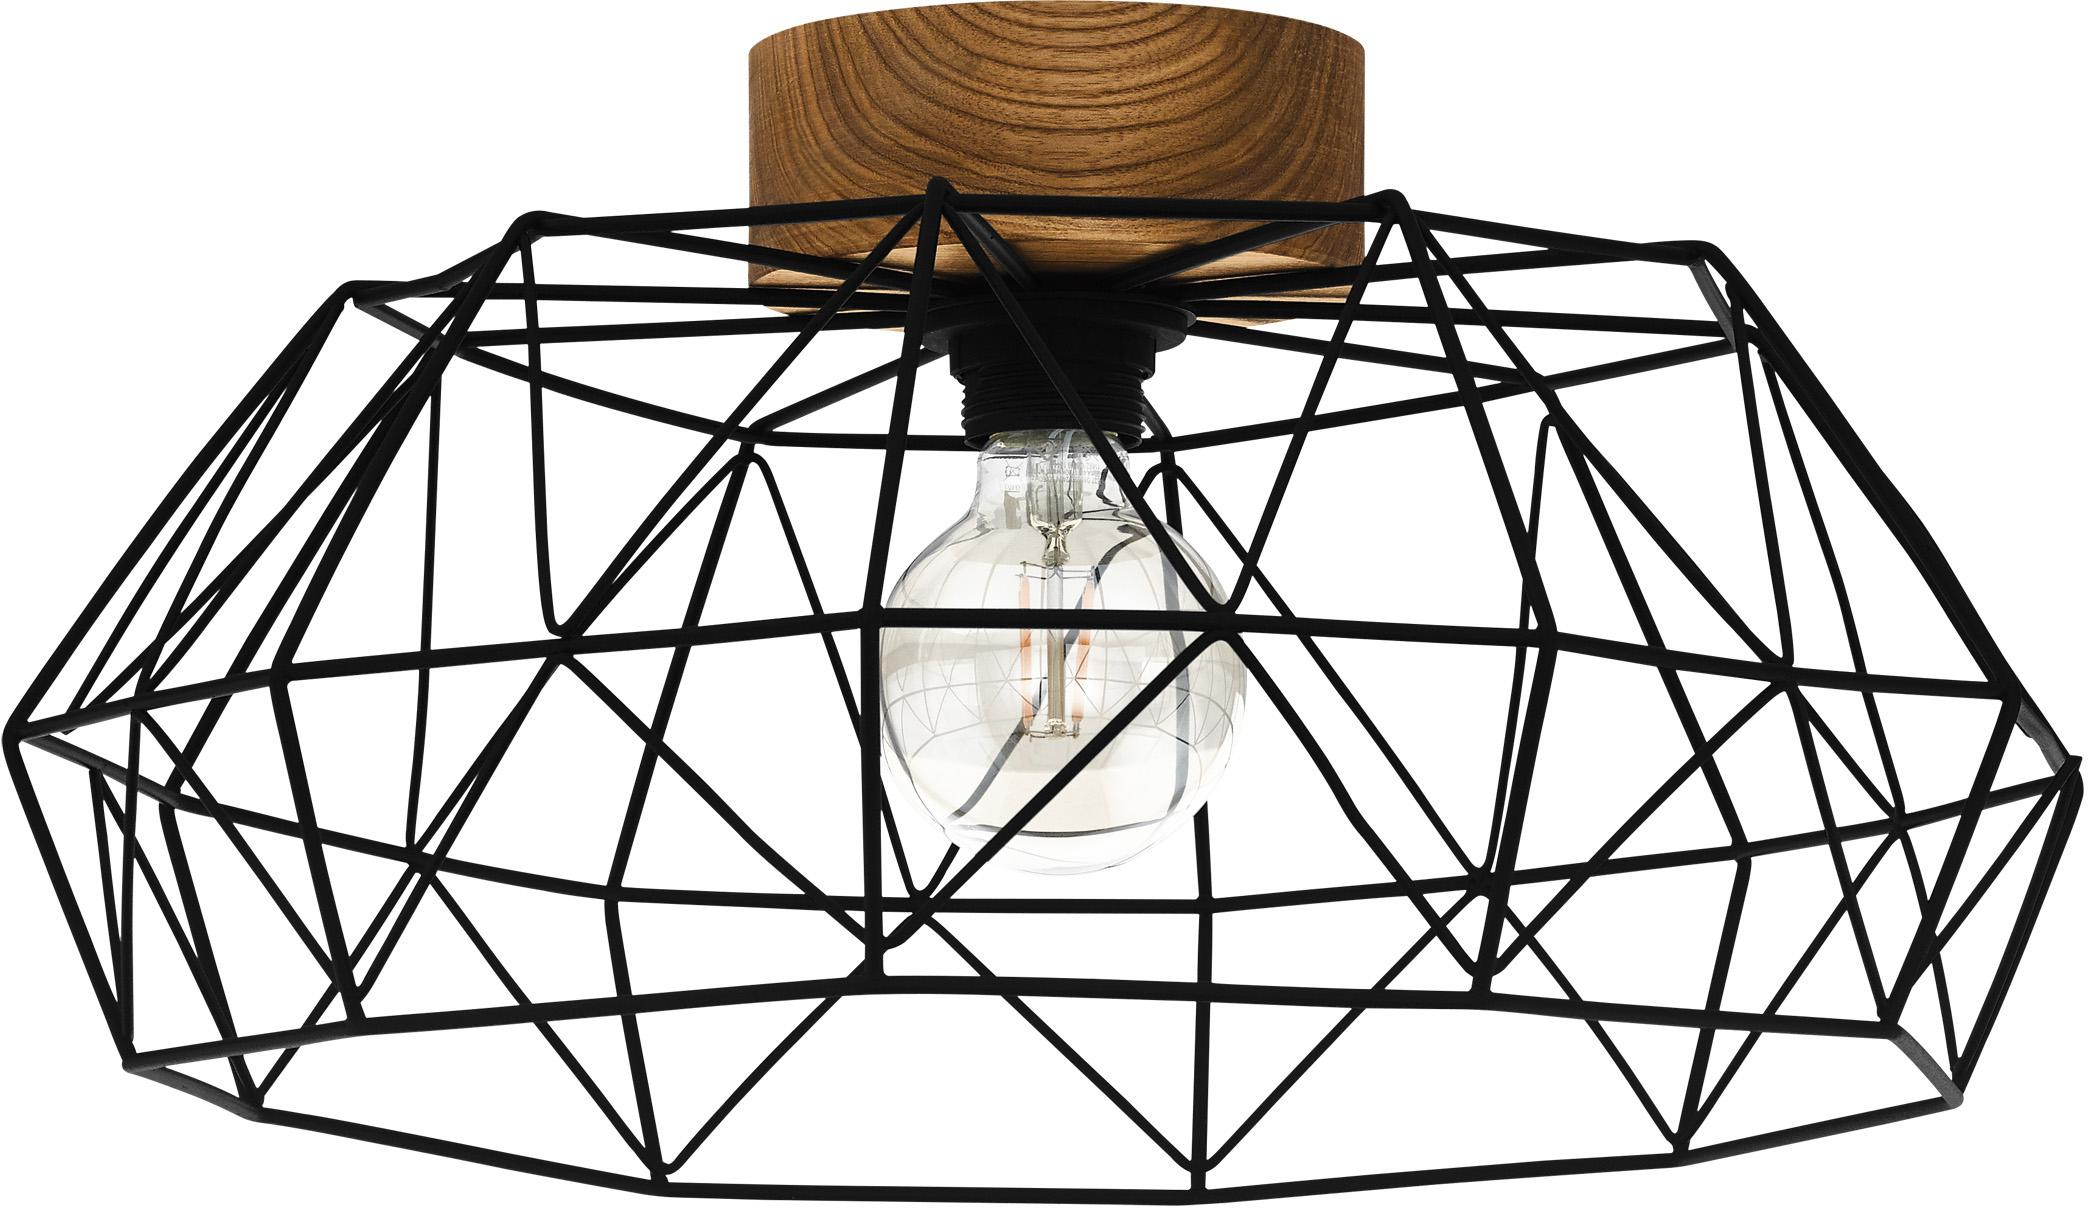 Plafoniera Padstow, Paralume: metallo verniciato, Baldacchino: legno, Nero, Ø 46 x Alt. 21 cm